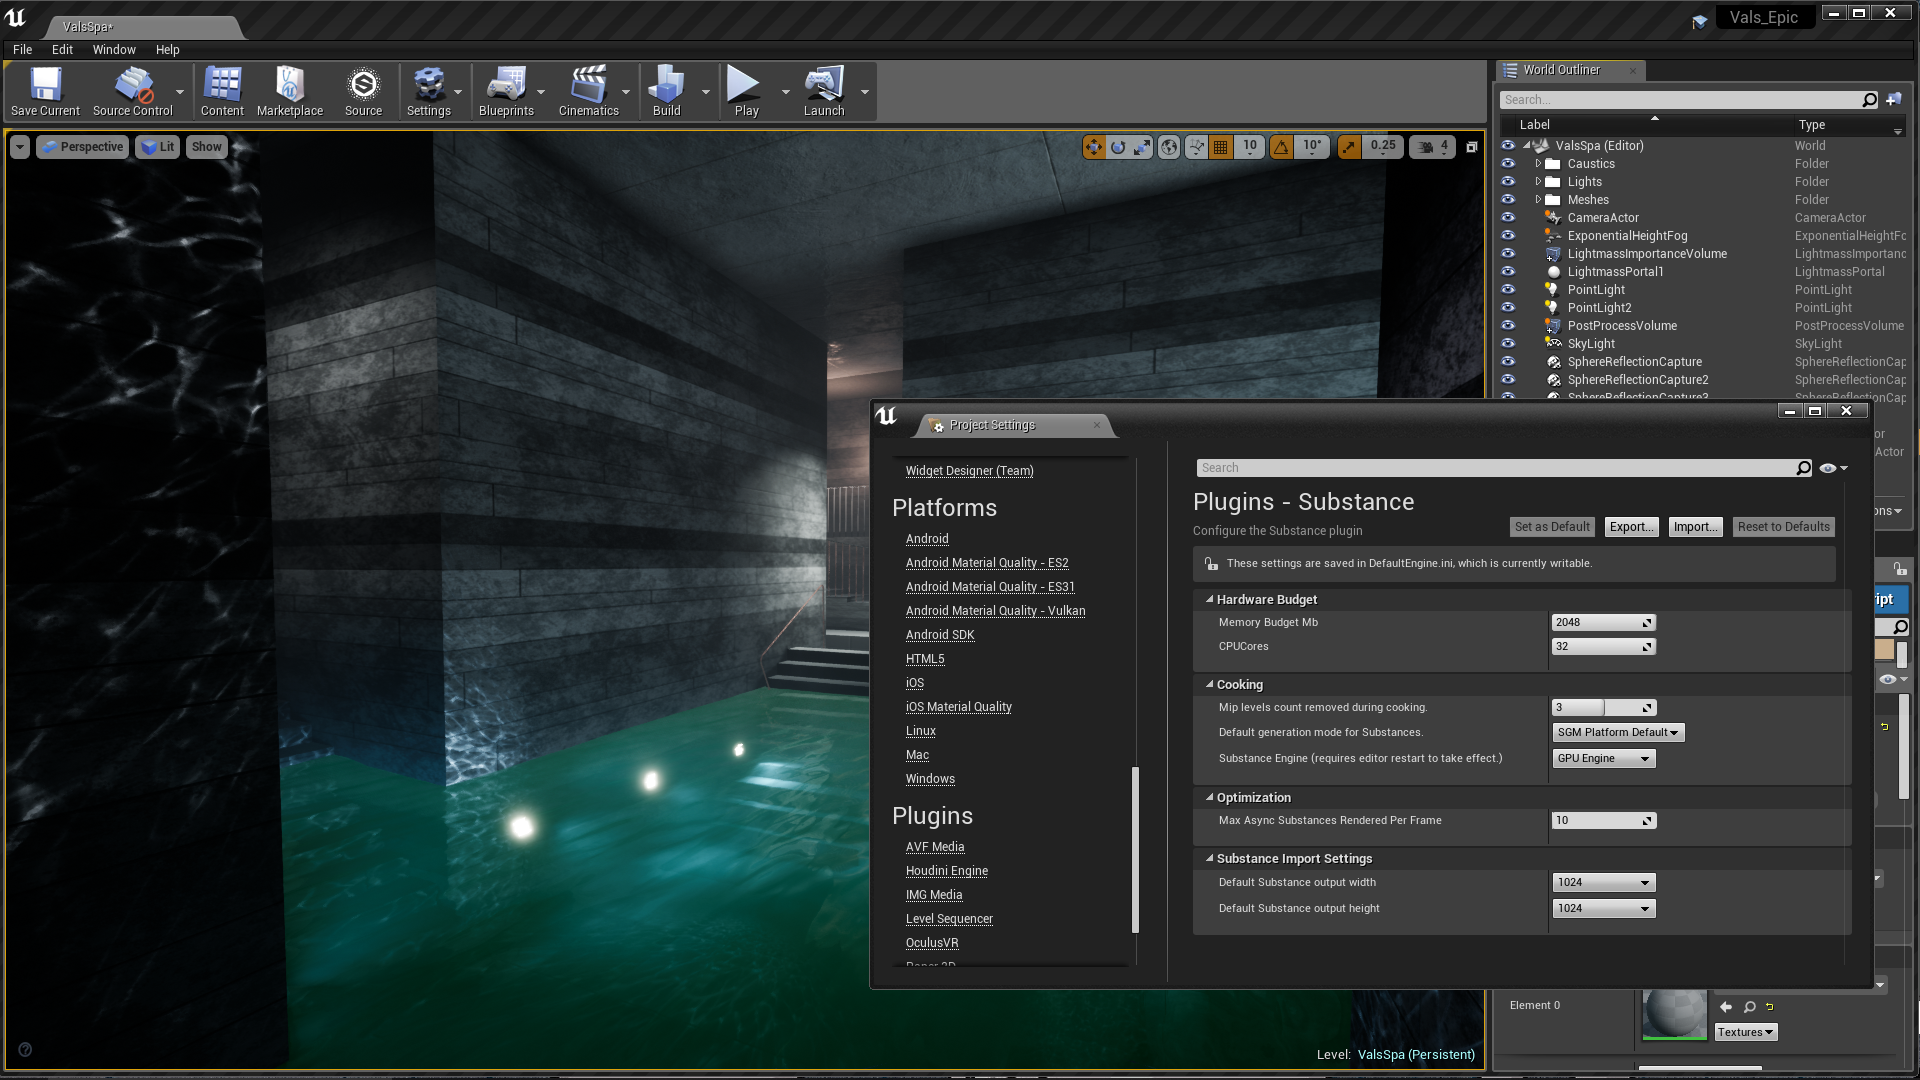 Substance in Unreal Engine by Allegorithmic in Code Plugins - UE4